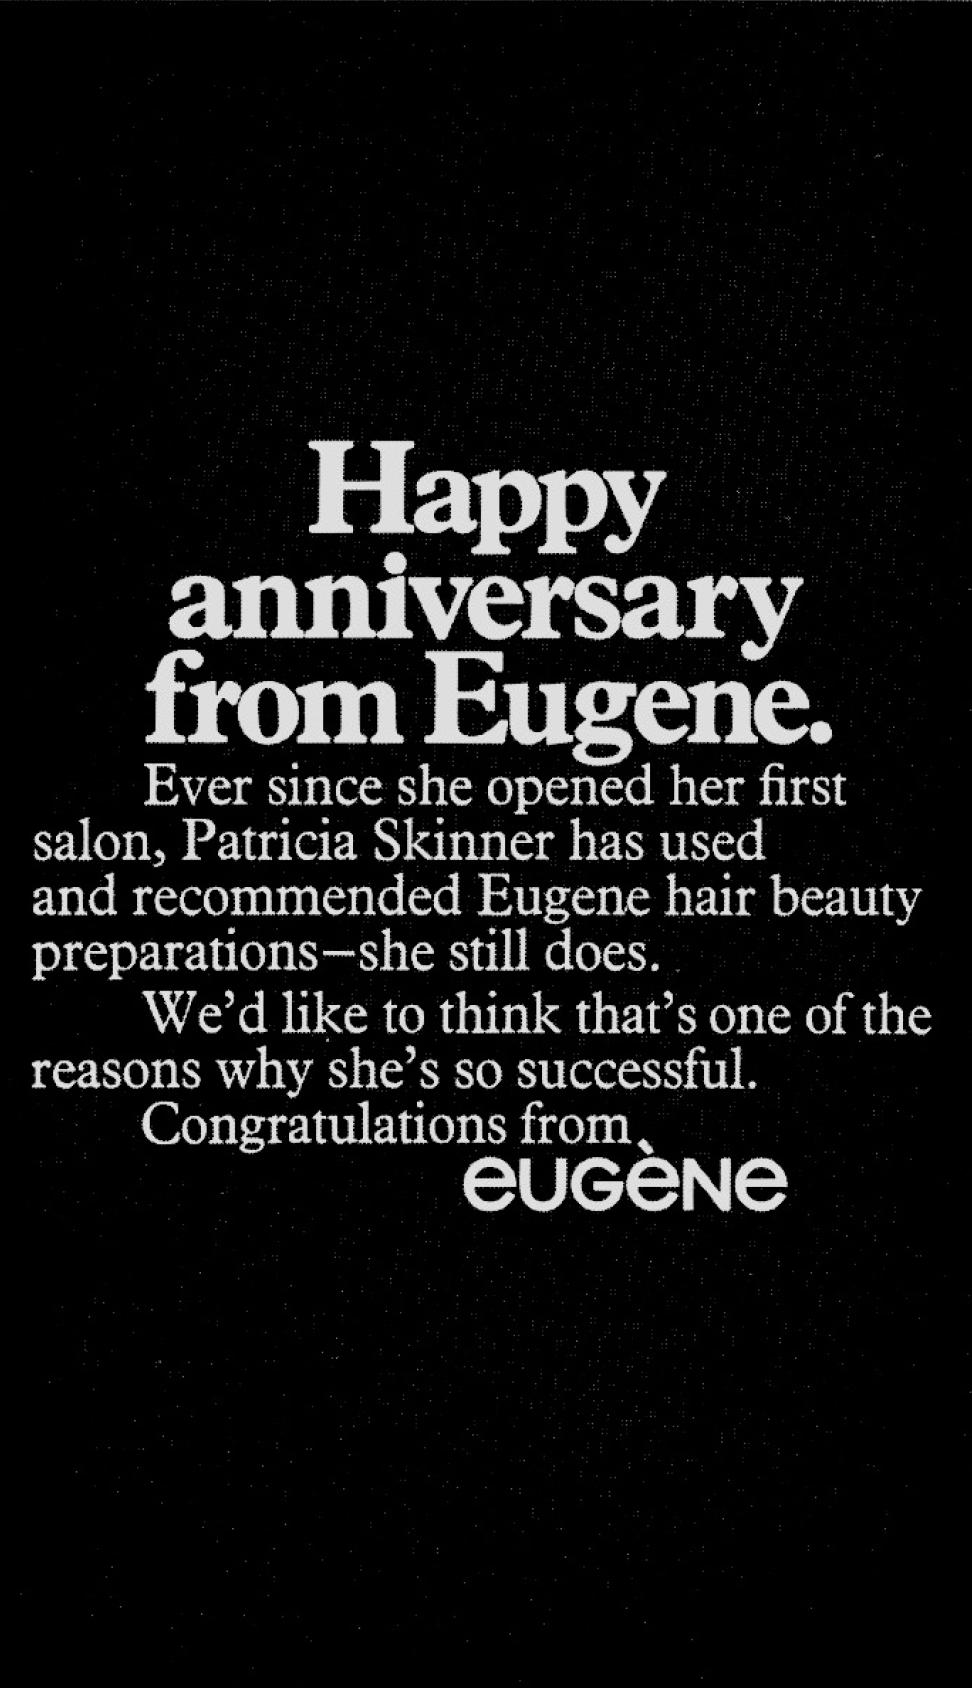 Eugenie, John O'Driscoll